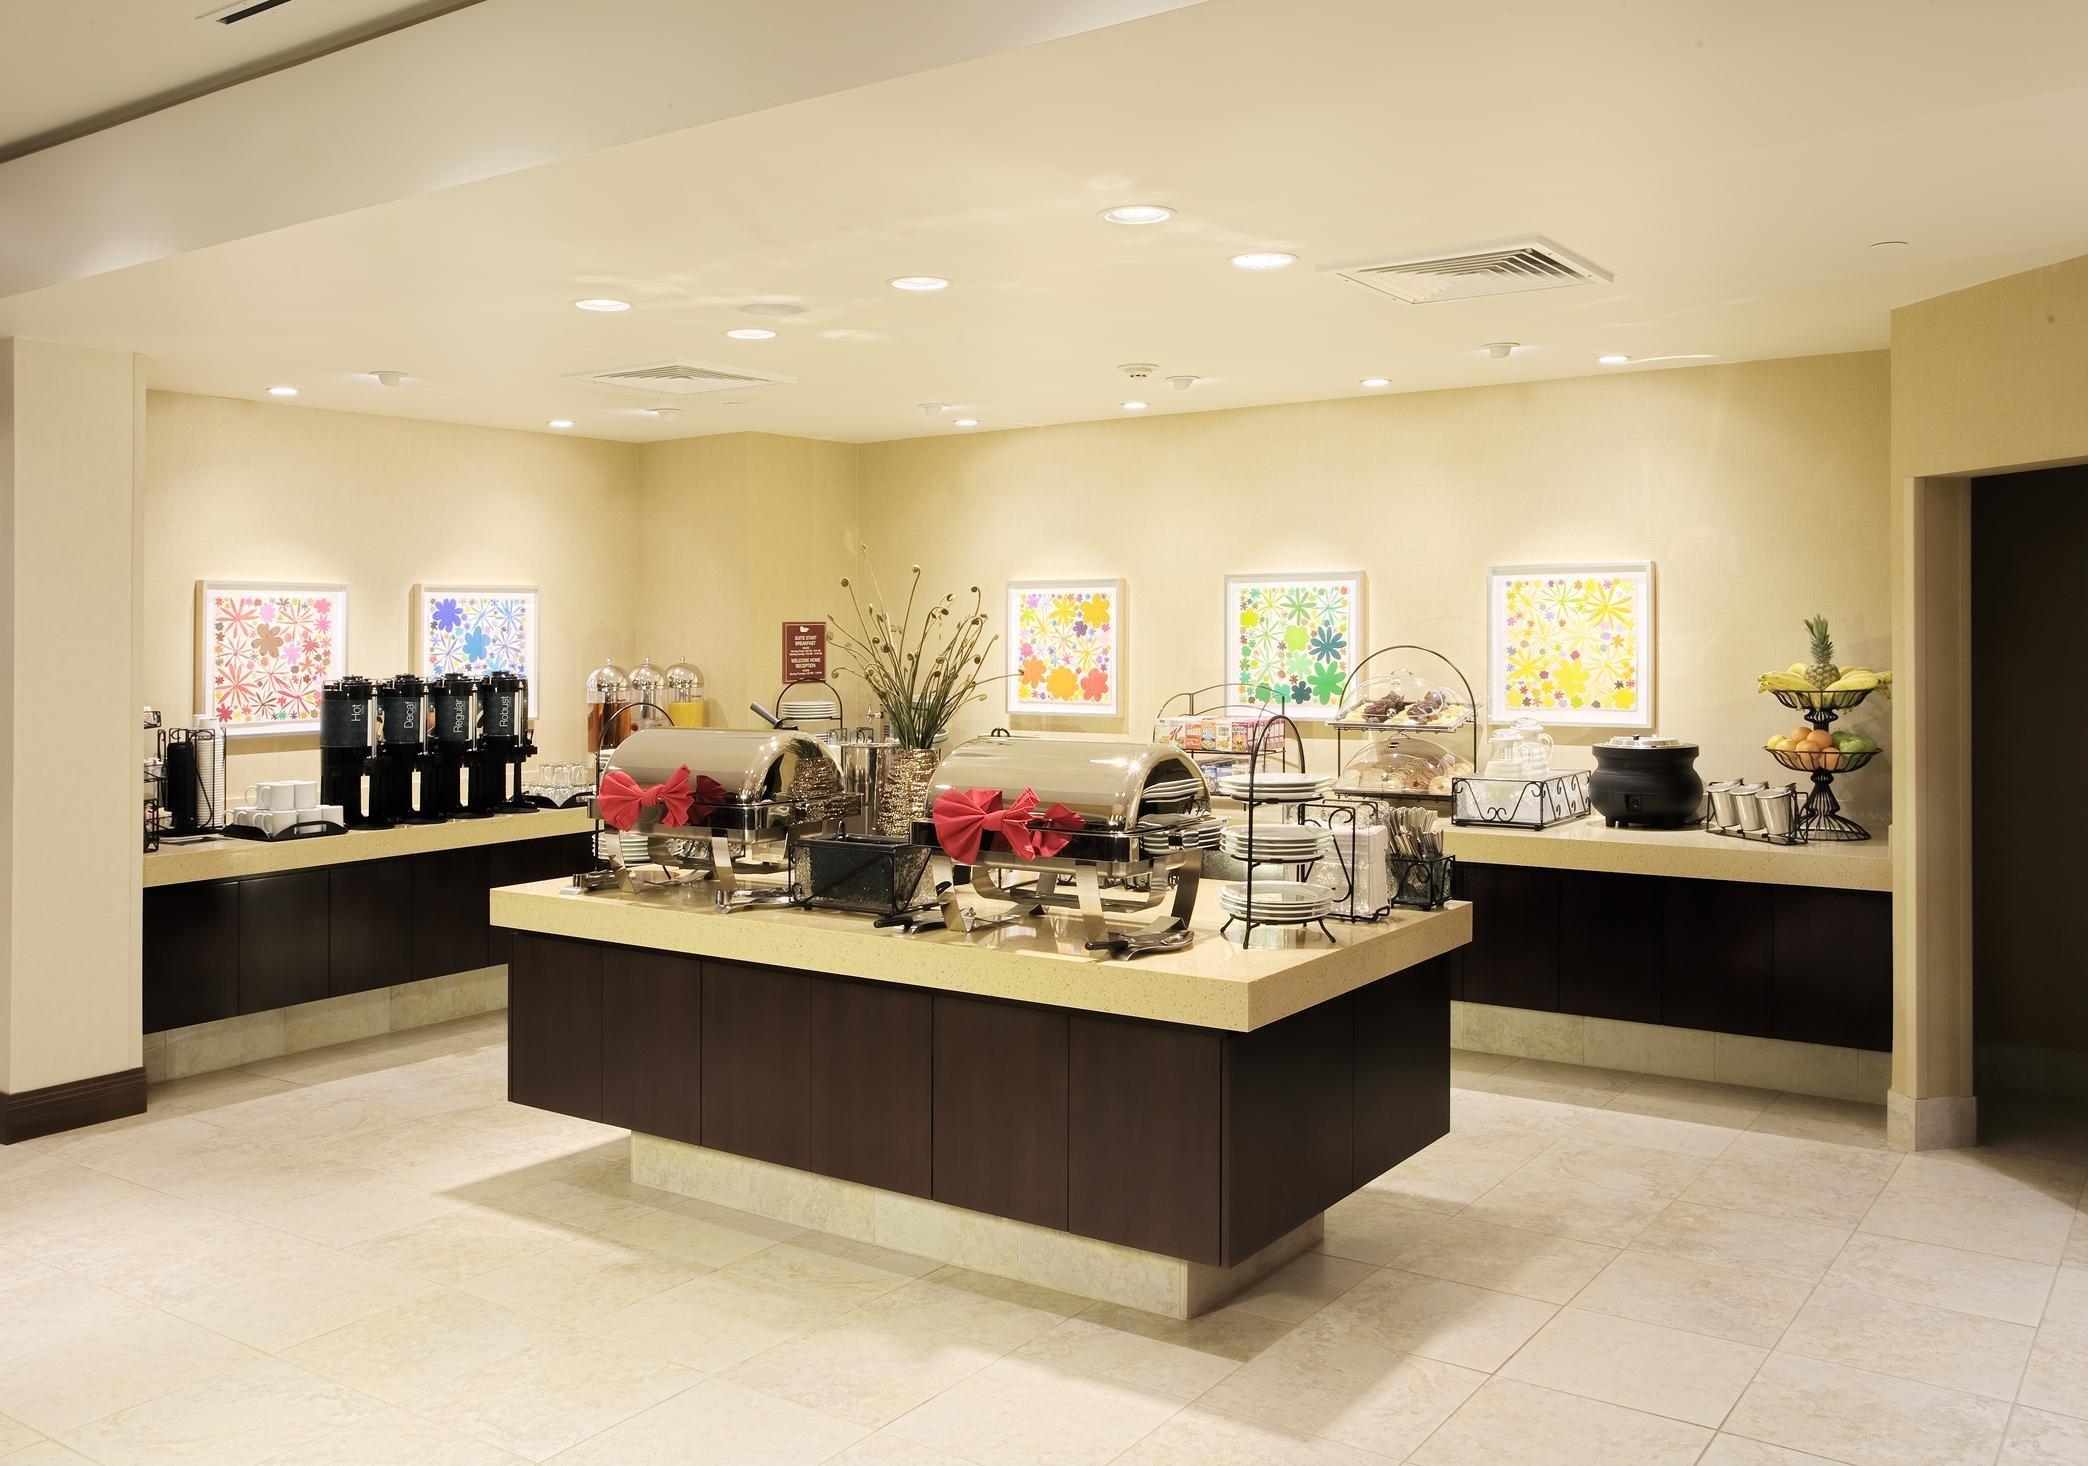 Homewood Suites By Hilton Dallas Allen At 455 Central